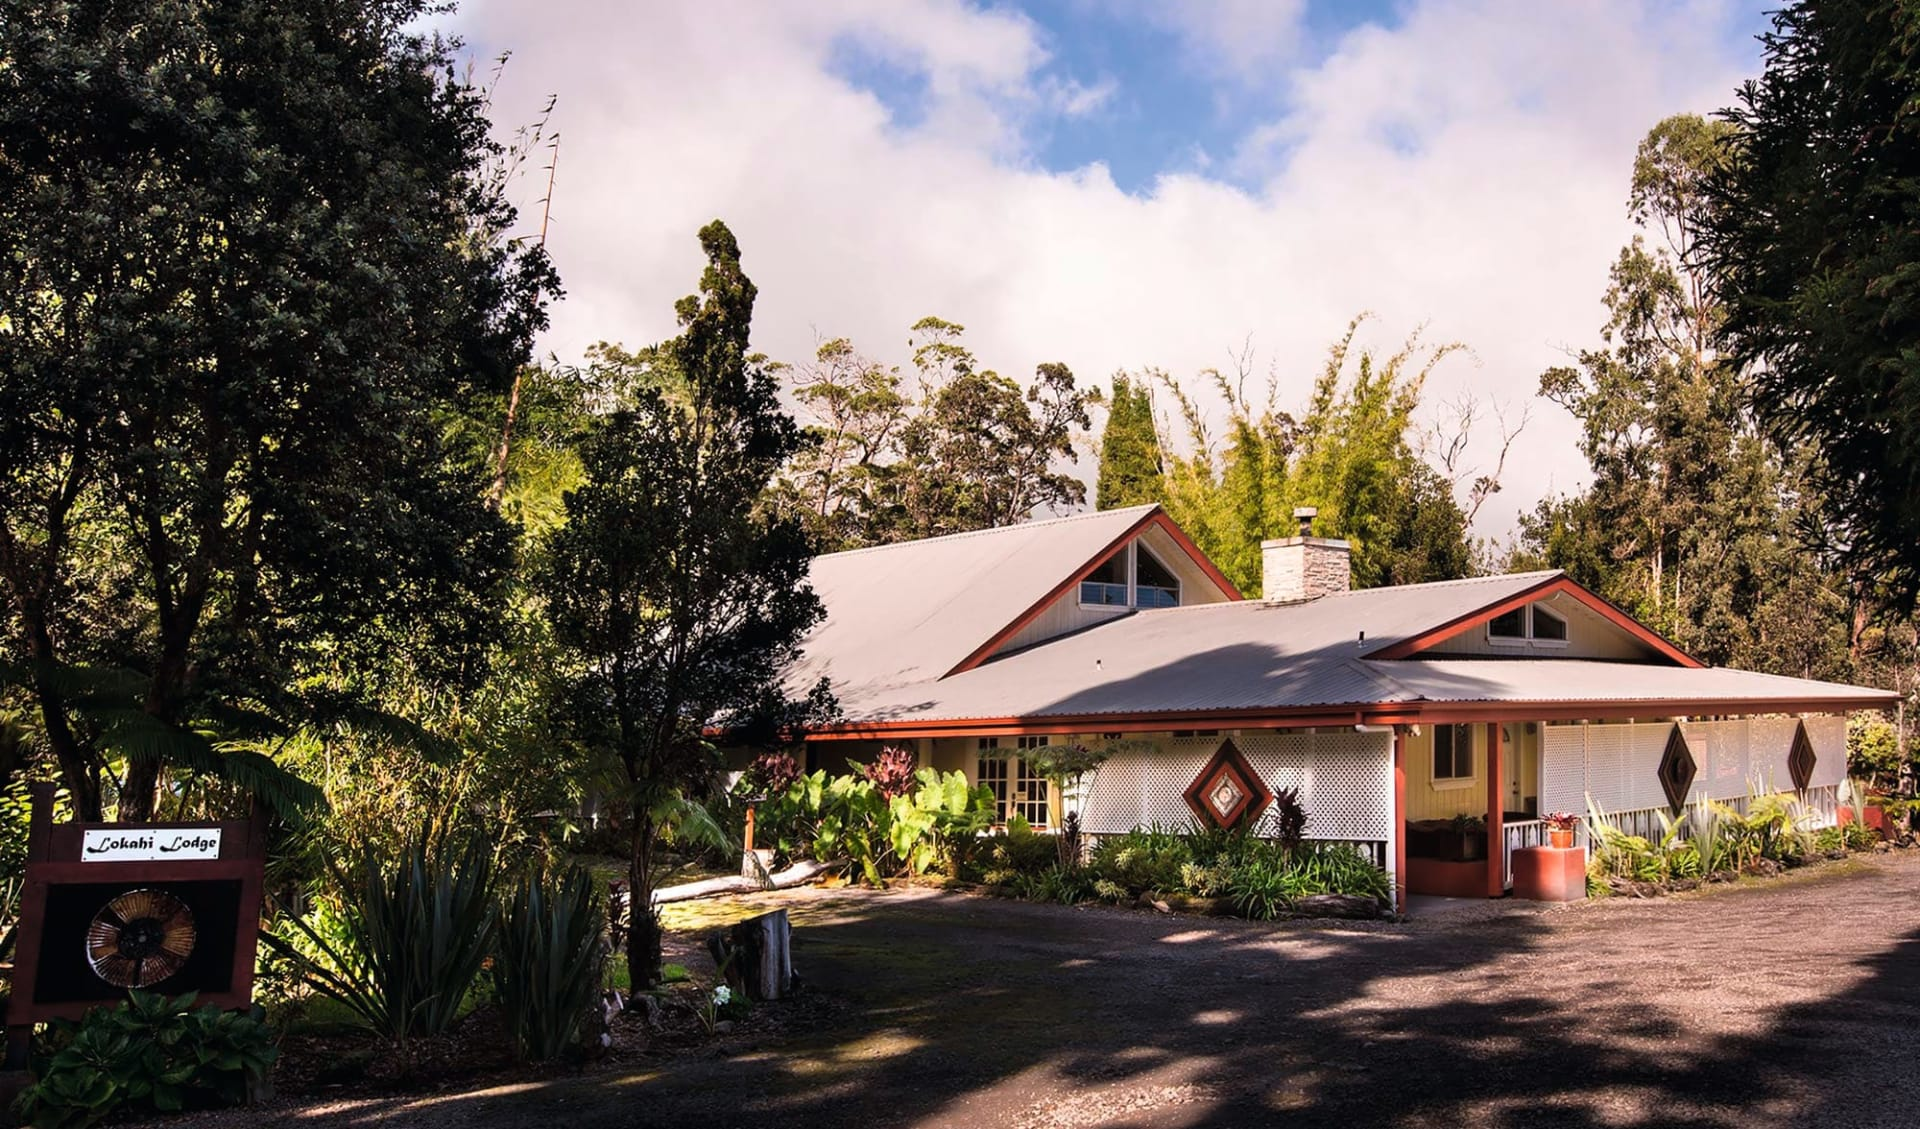 Chalet Kilauea - Lokahi Lodge in Hawaii Volcanoes National Park: Exterior_Lokahi Lodge-exterior-lg